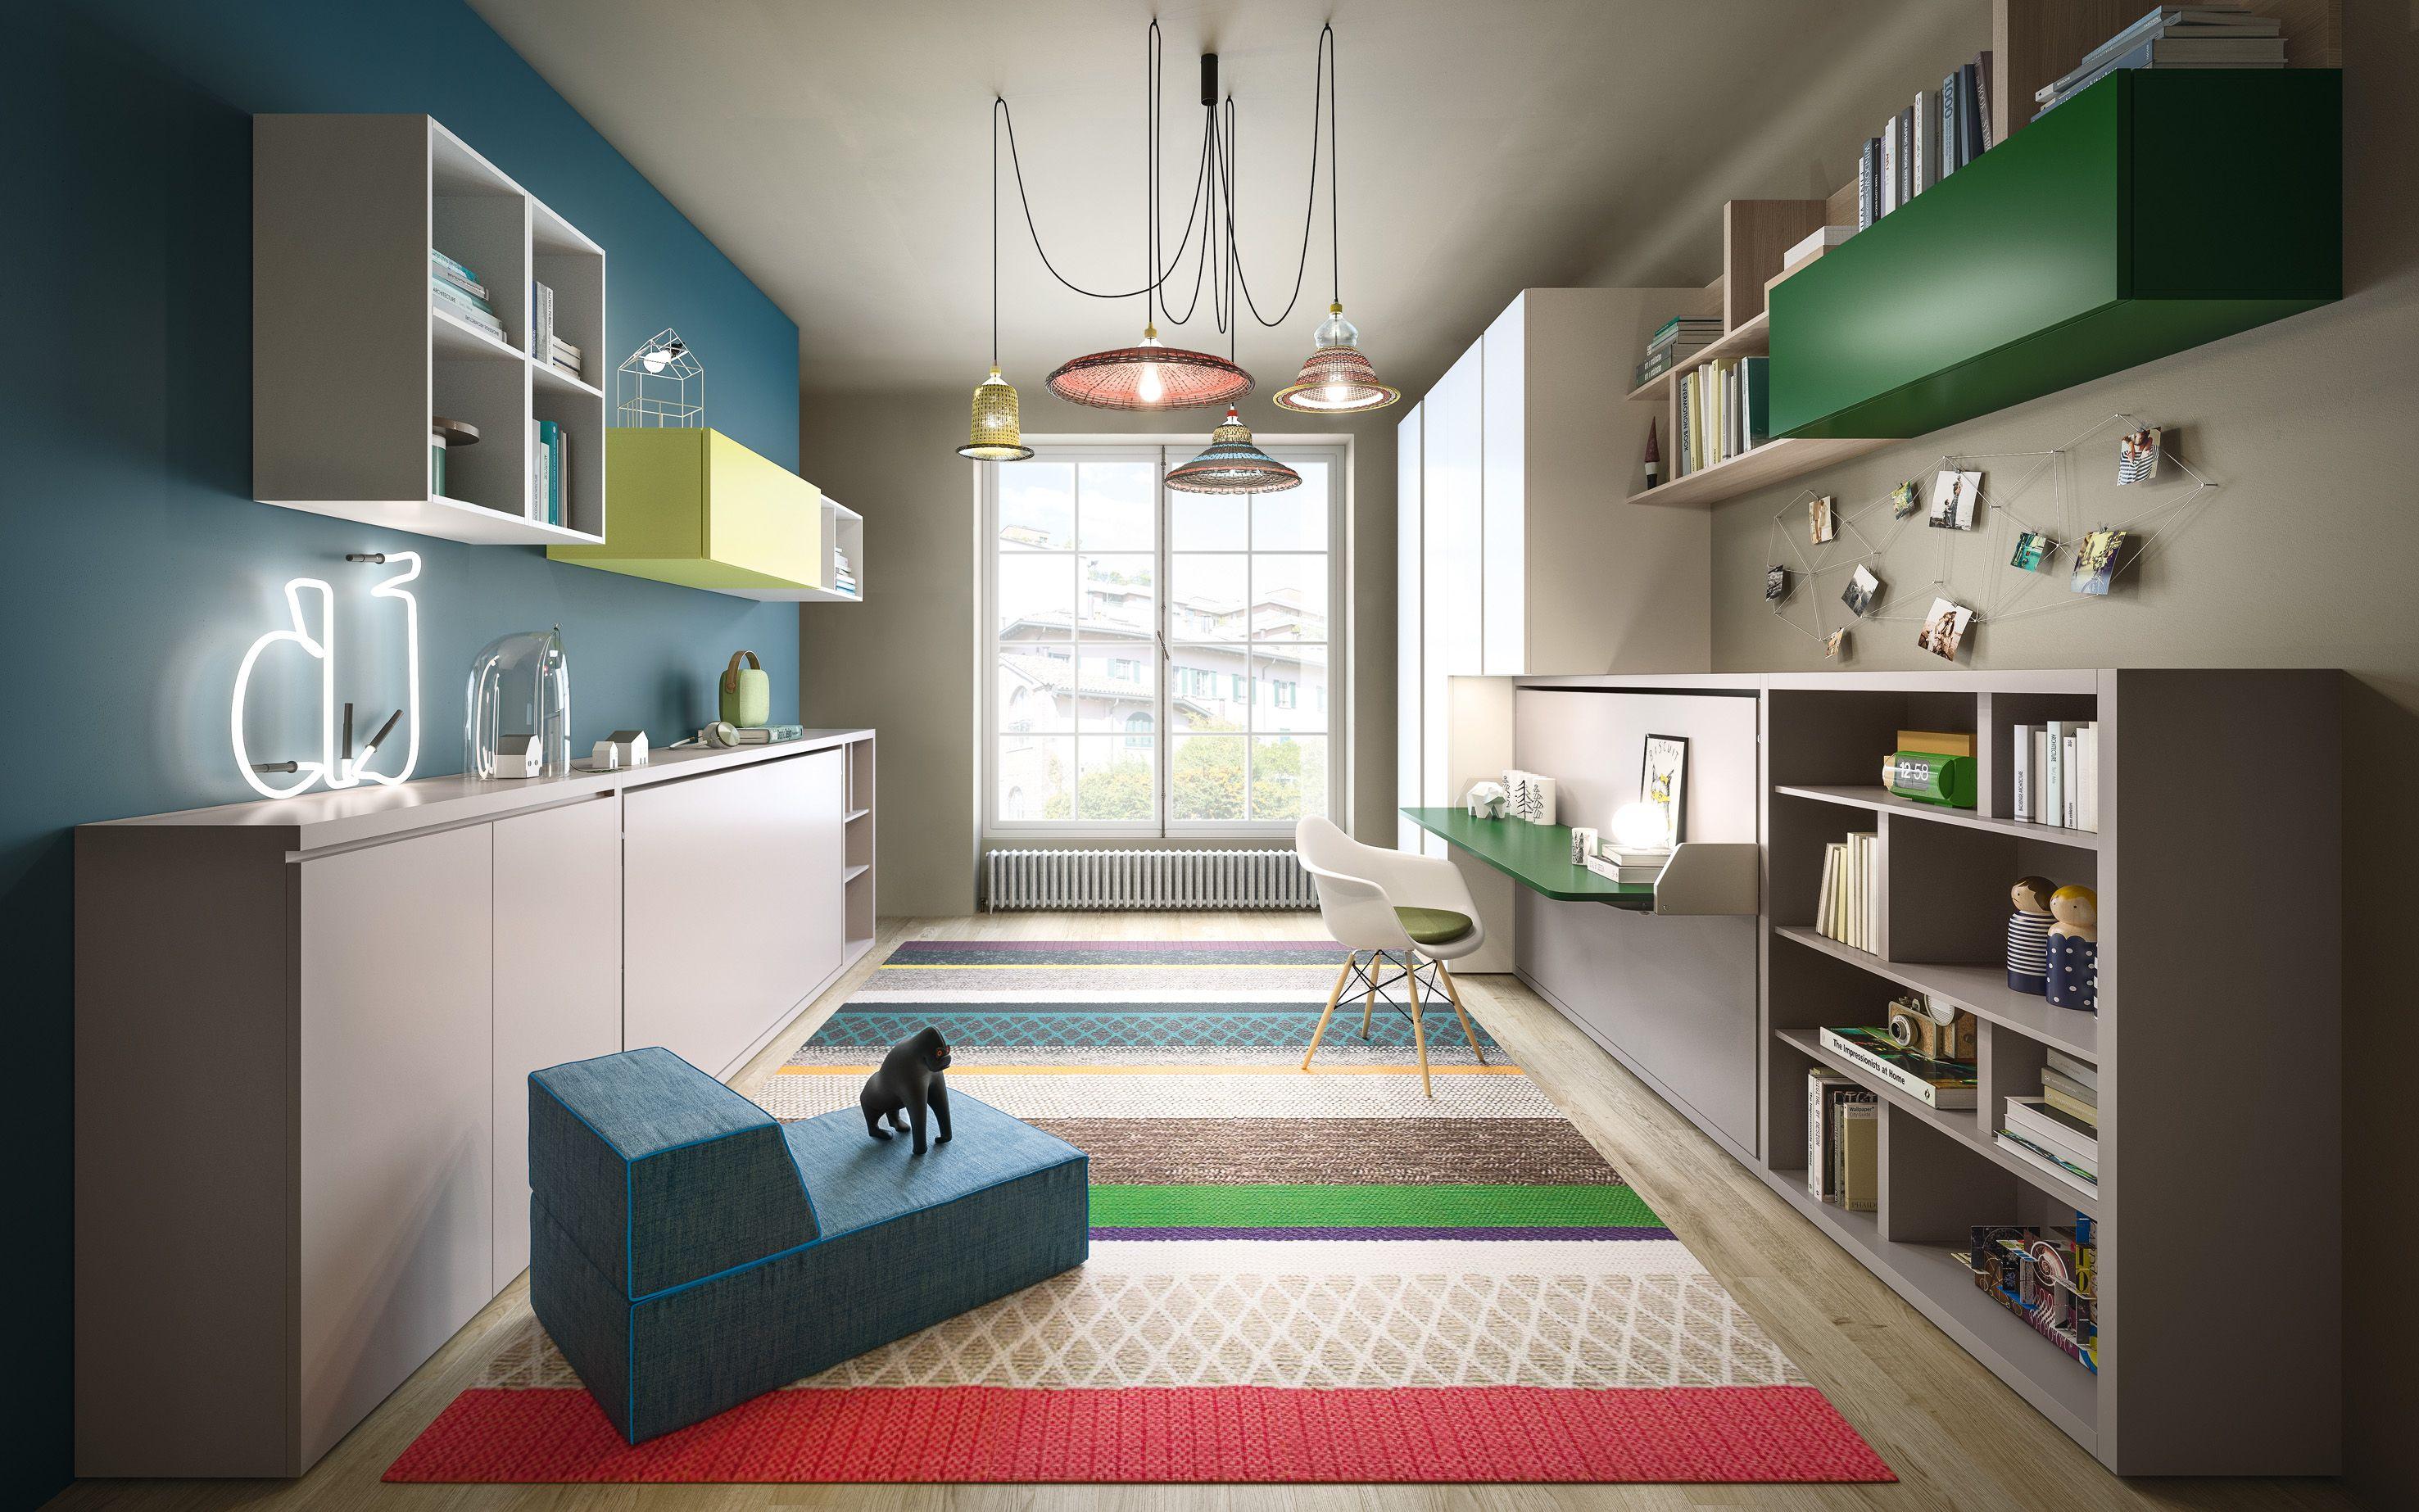 venezia design bed c venice board rentals in room and architecture ca apartments apartment